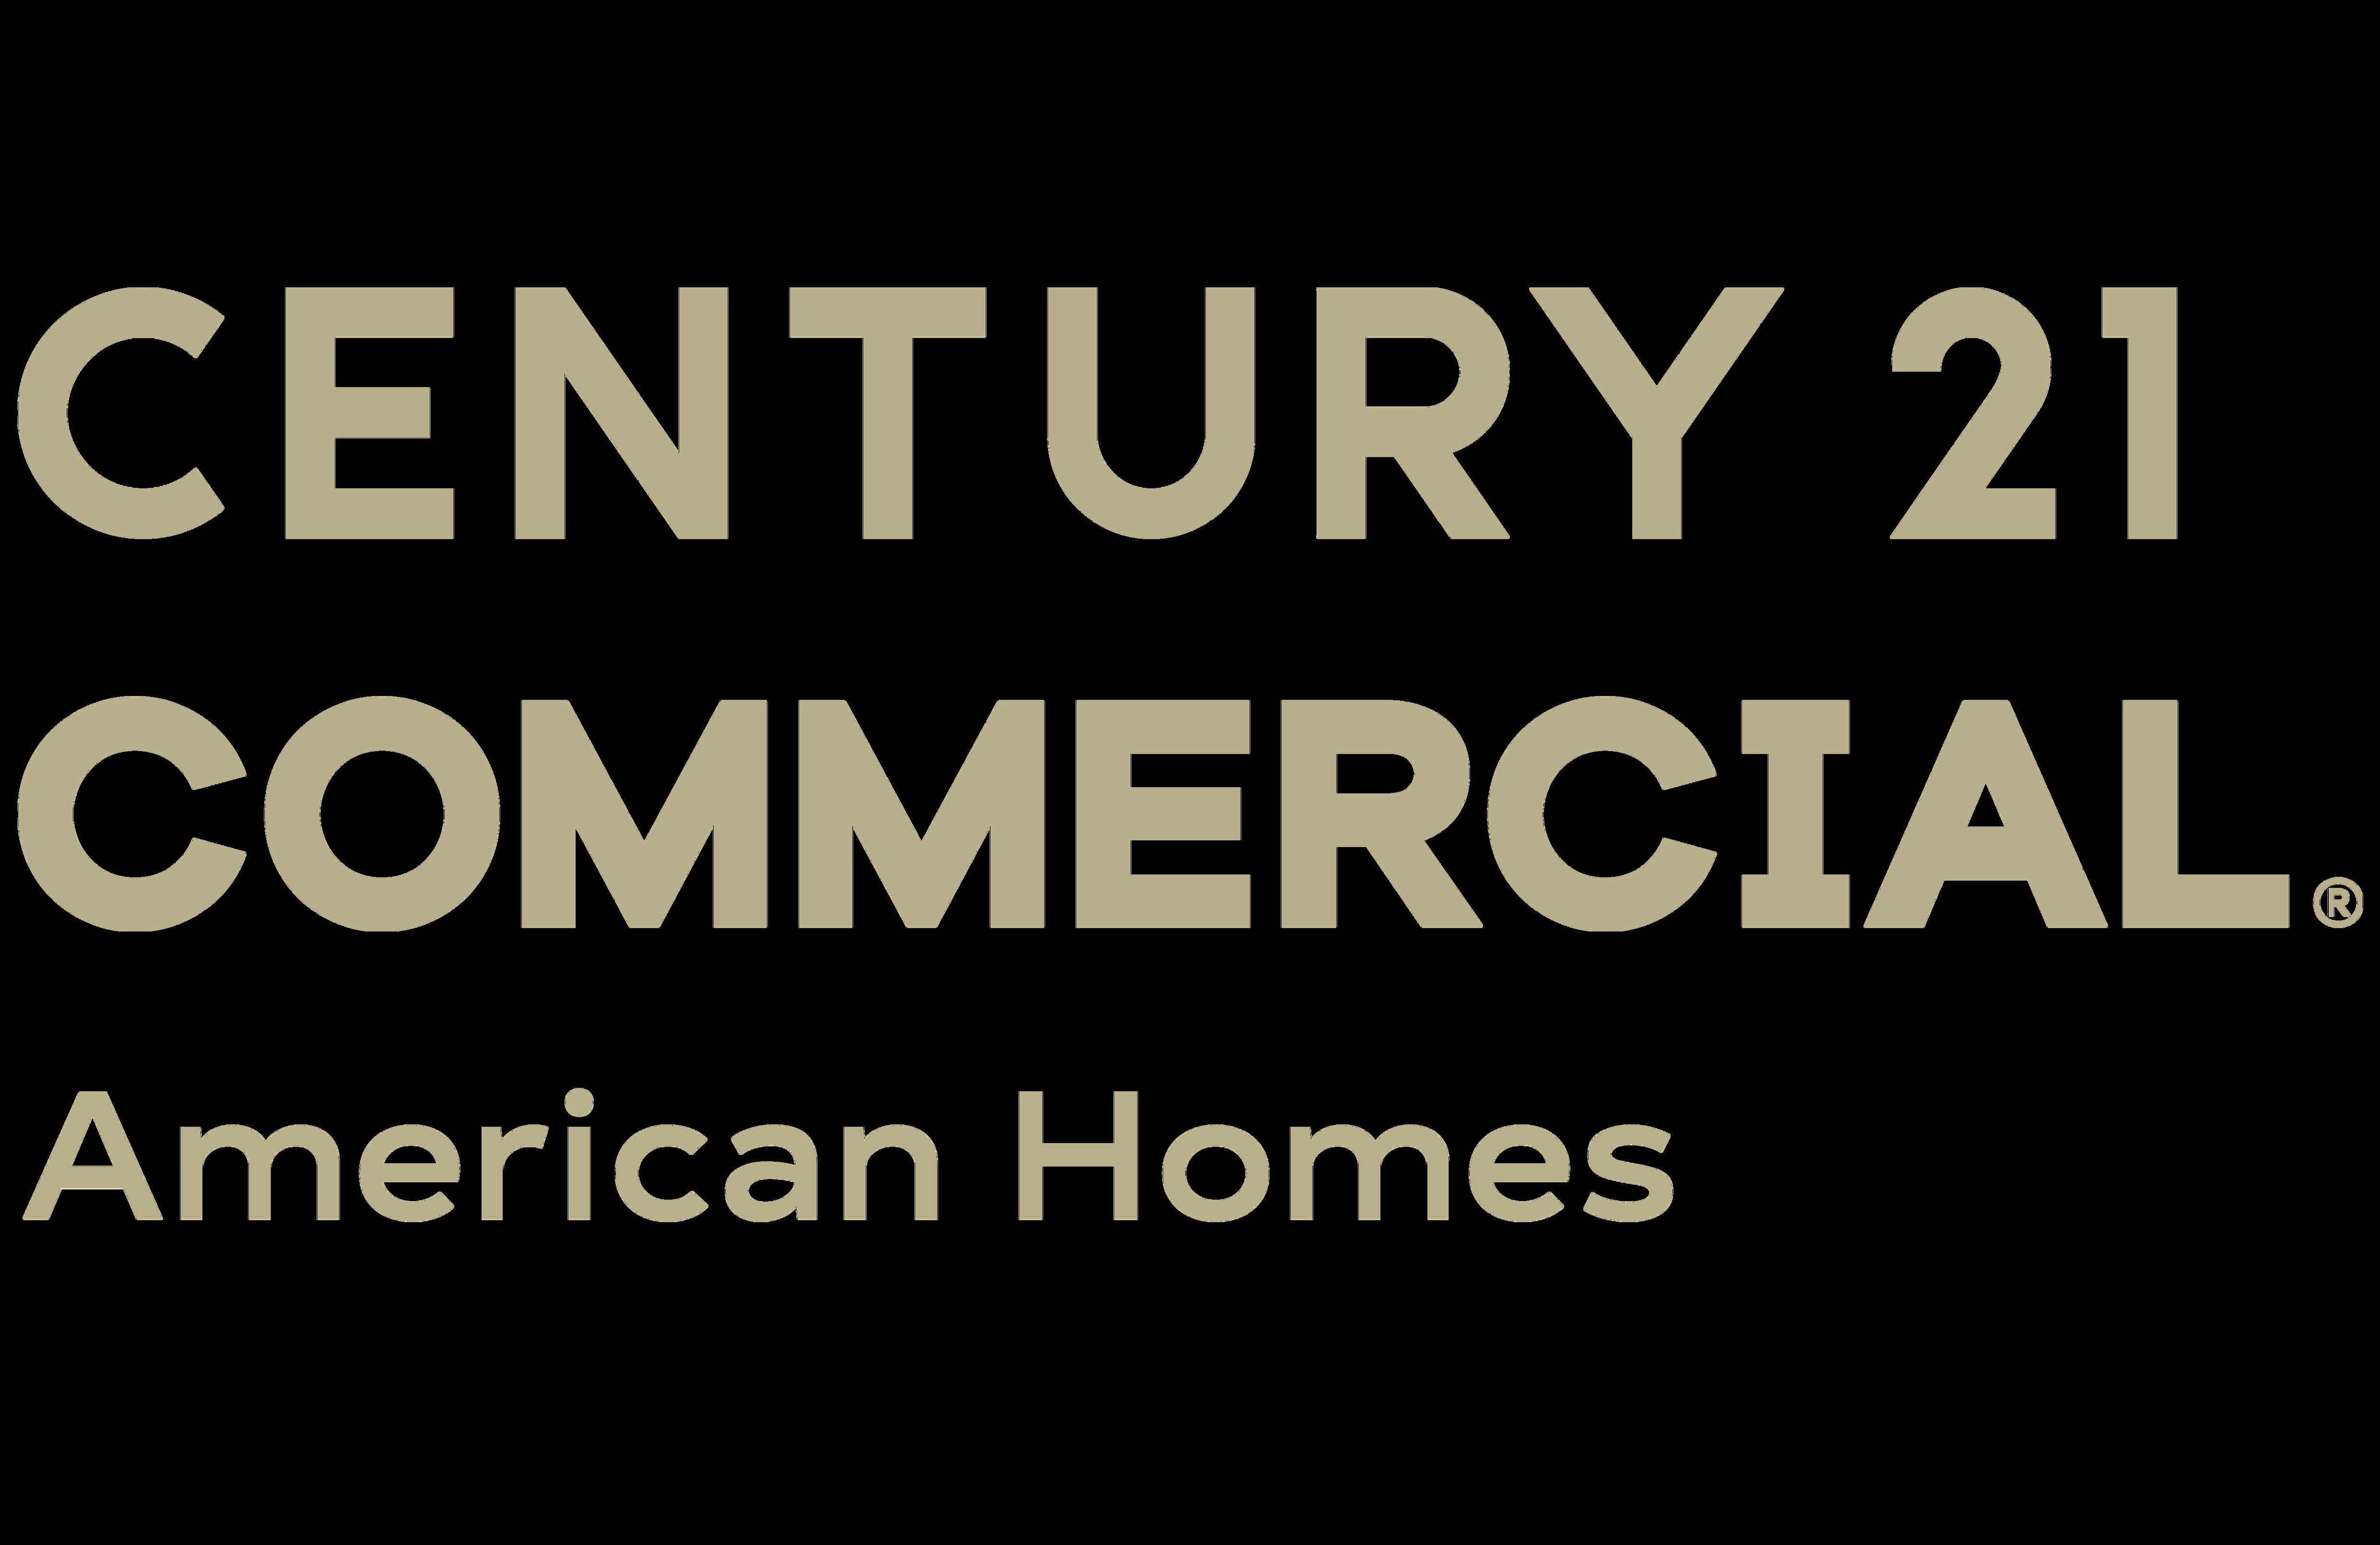 CENTURY 21 American Homes